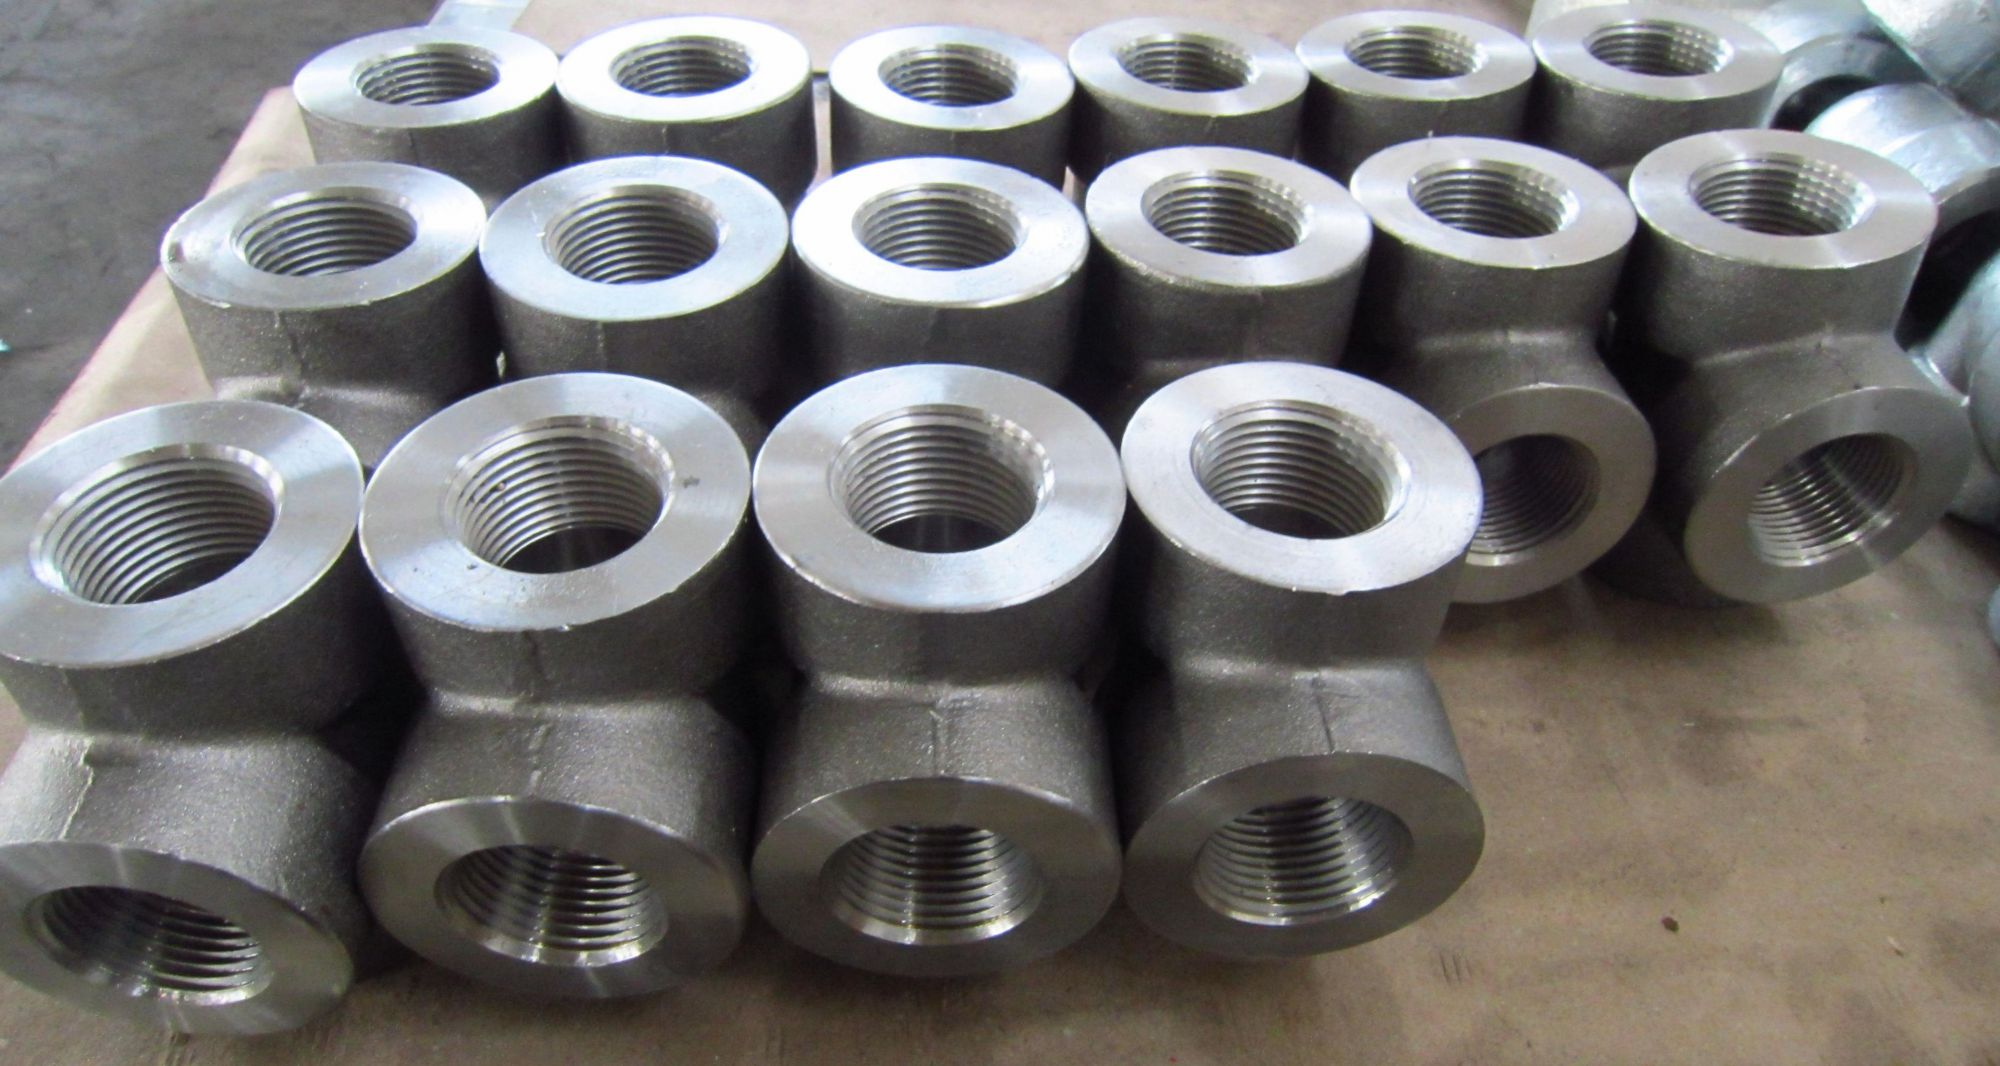 ASTM A105 Hexagon Plug, 3000 LB, 2 Inch, NPT Ends